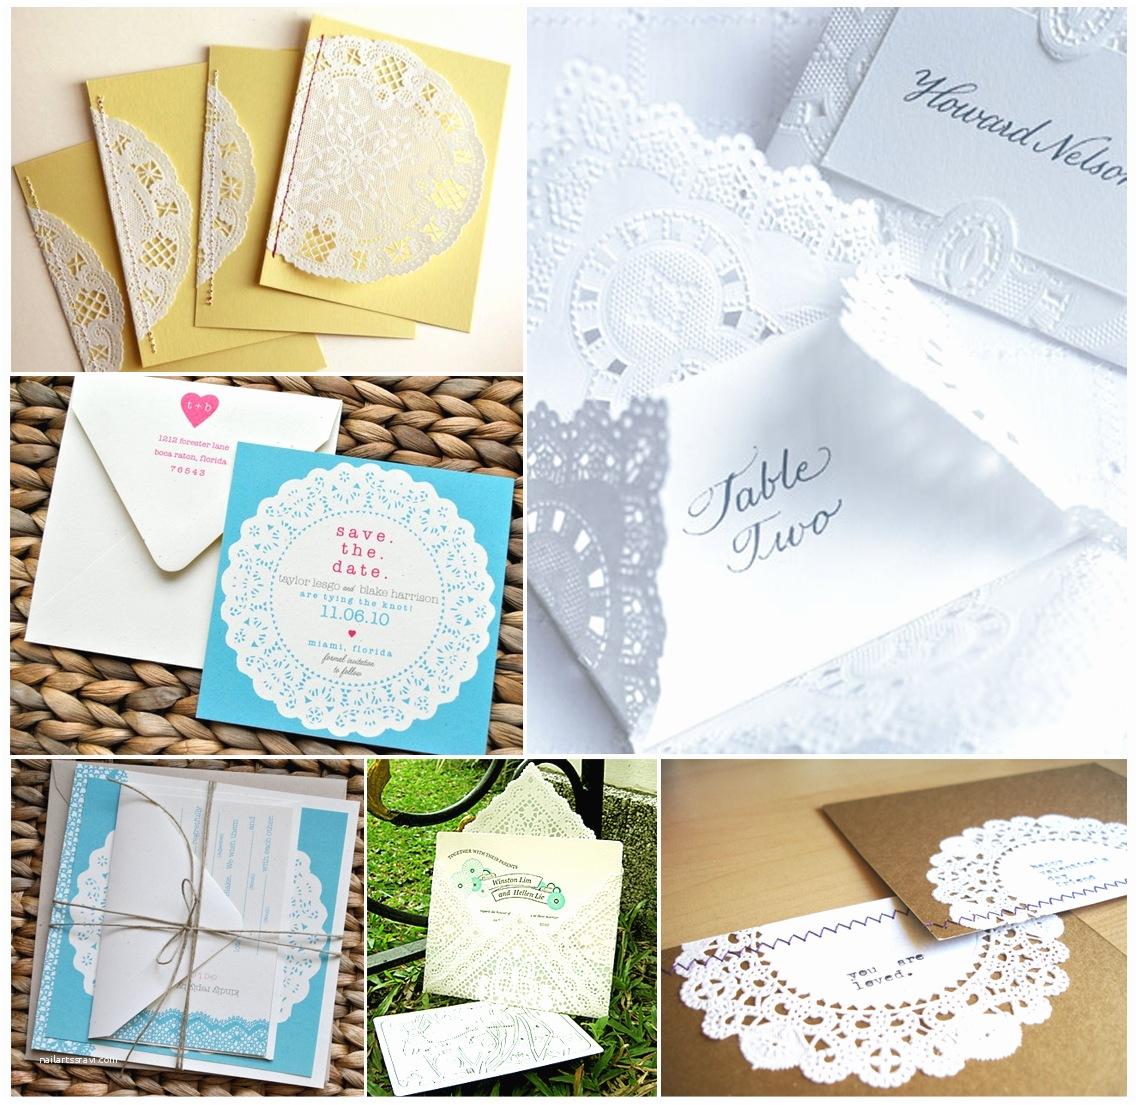 Doily Wedding Invitations Vintage Wedding Stationery Doilies Wedding Invitations